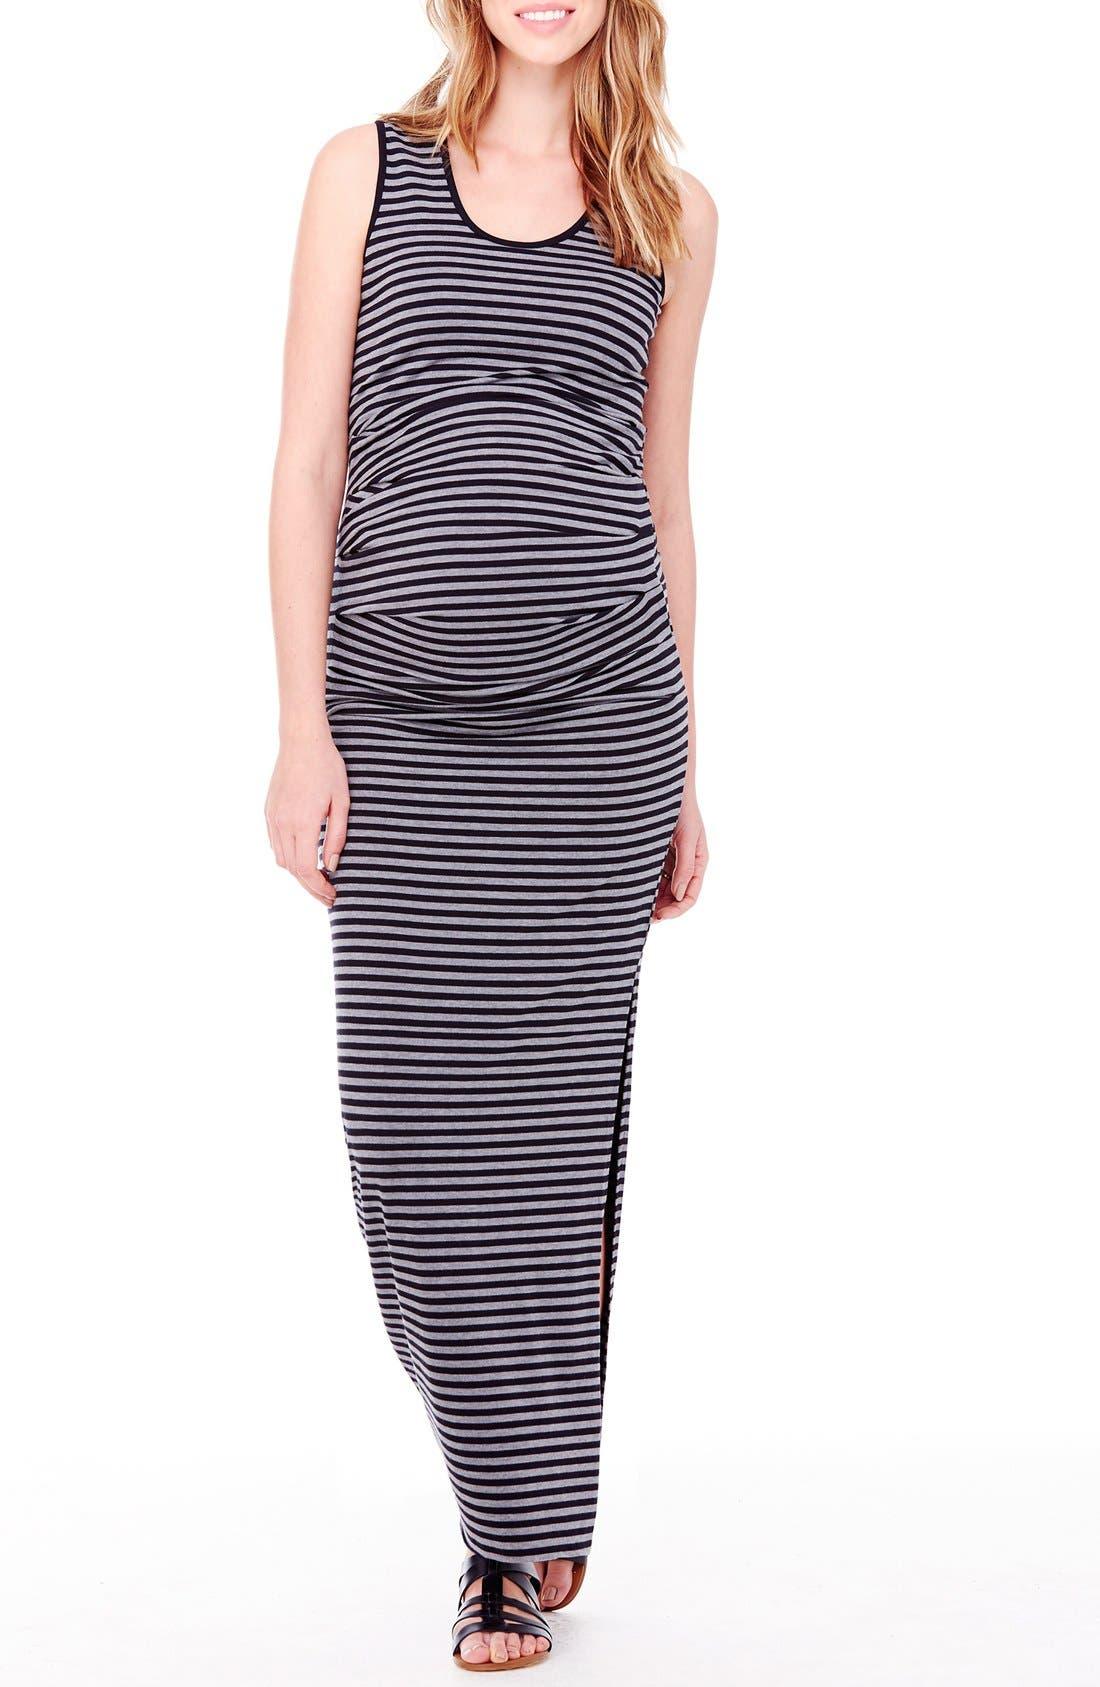 Ingrid & Isabel® Striped Tank Maternity Maxi Dress